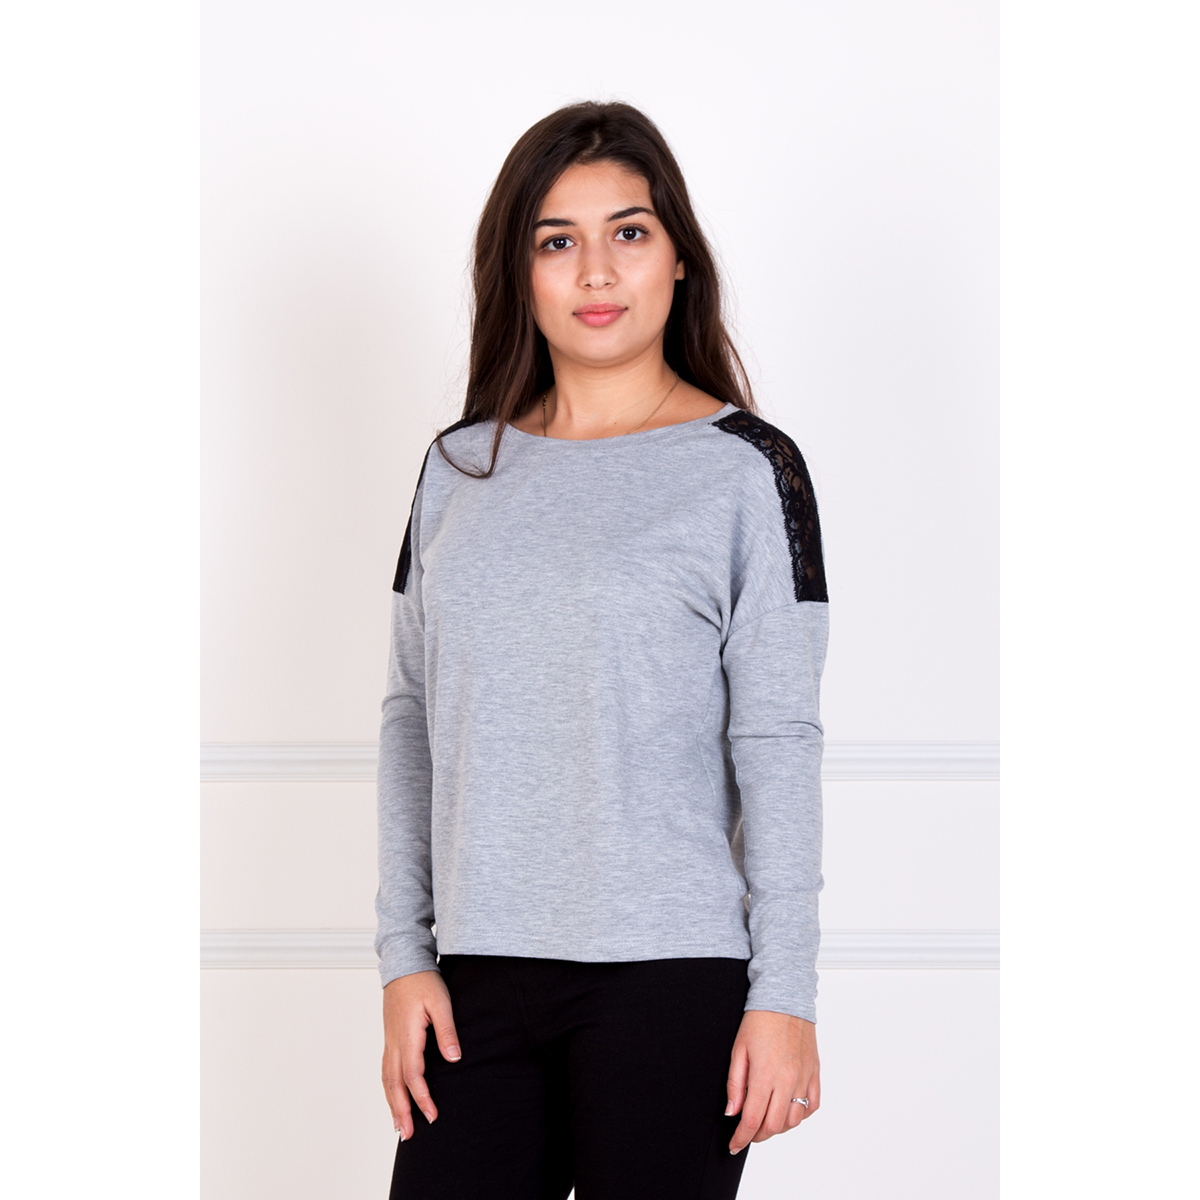 Женская блуза Рива, размер 52Блузы<br>Обхват груди:104 см<br>Обхват талии:85 см<br>Обхват бедер:112 см<br>Рост:167 см<br><br>Тип: Жен. блуза<br>Размер: 52<br>Материал: Хамур